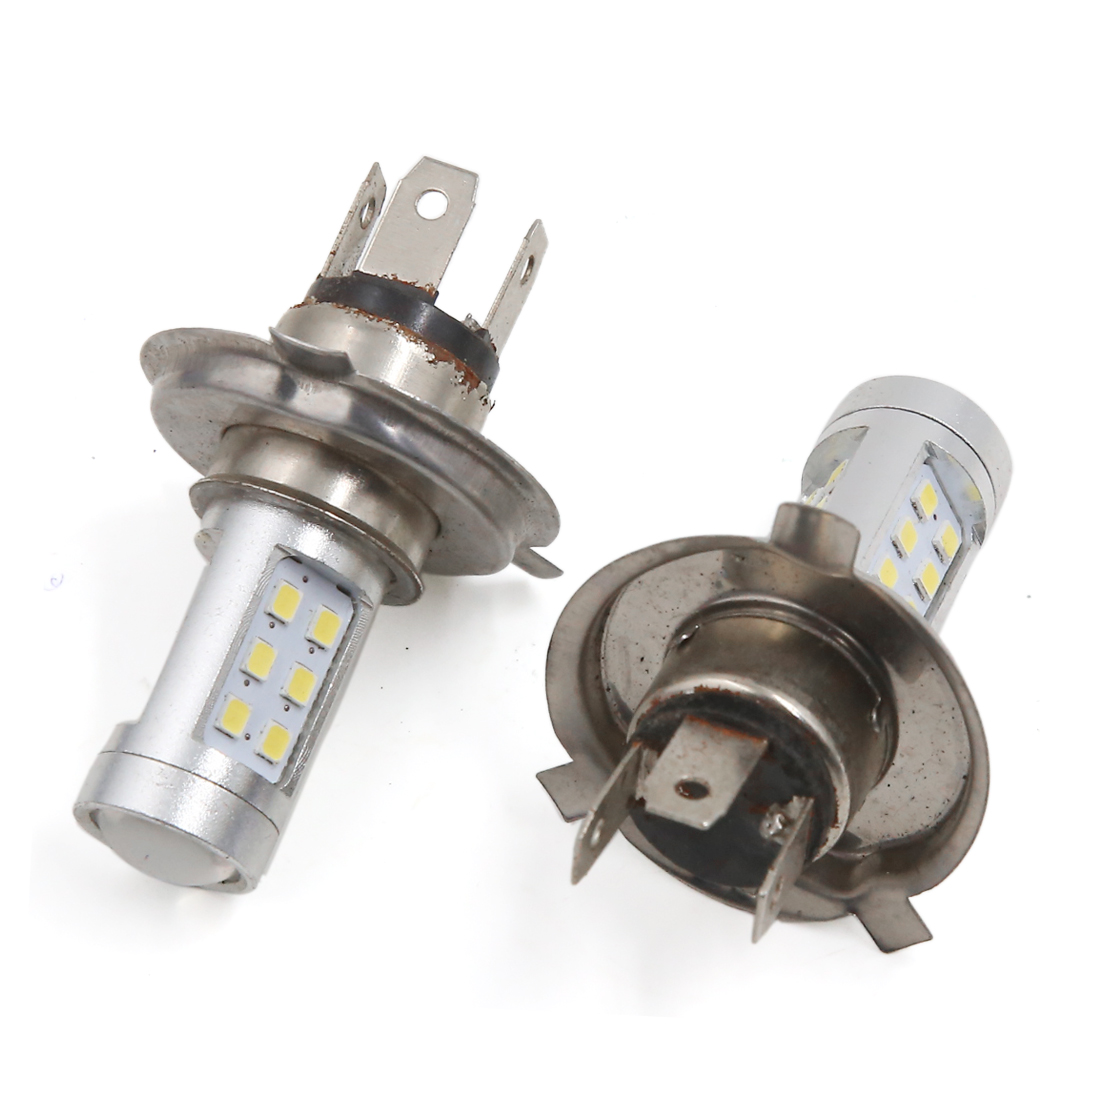 2 Pcs H4 1210 SMD 21 LED White Head Bulb Fog Light Lamp for Car Vehicle